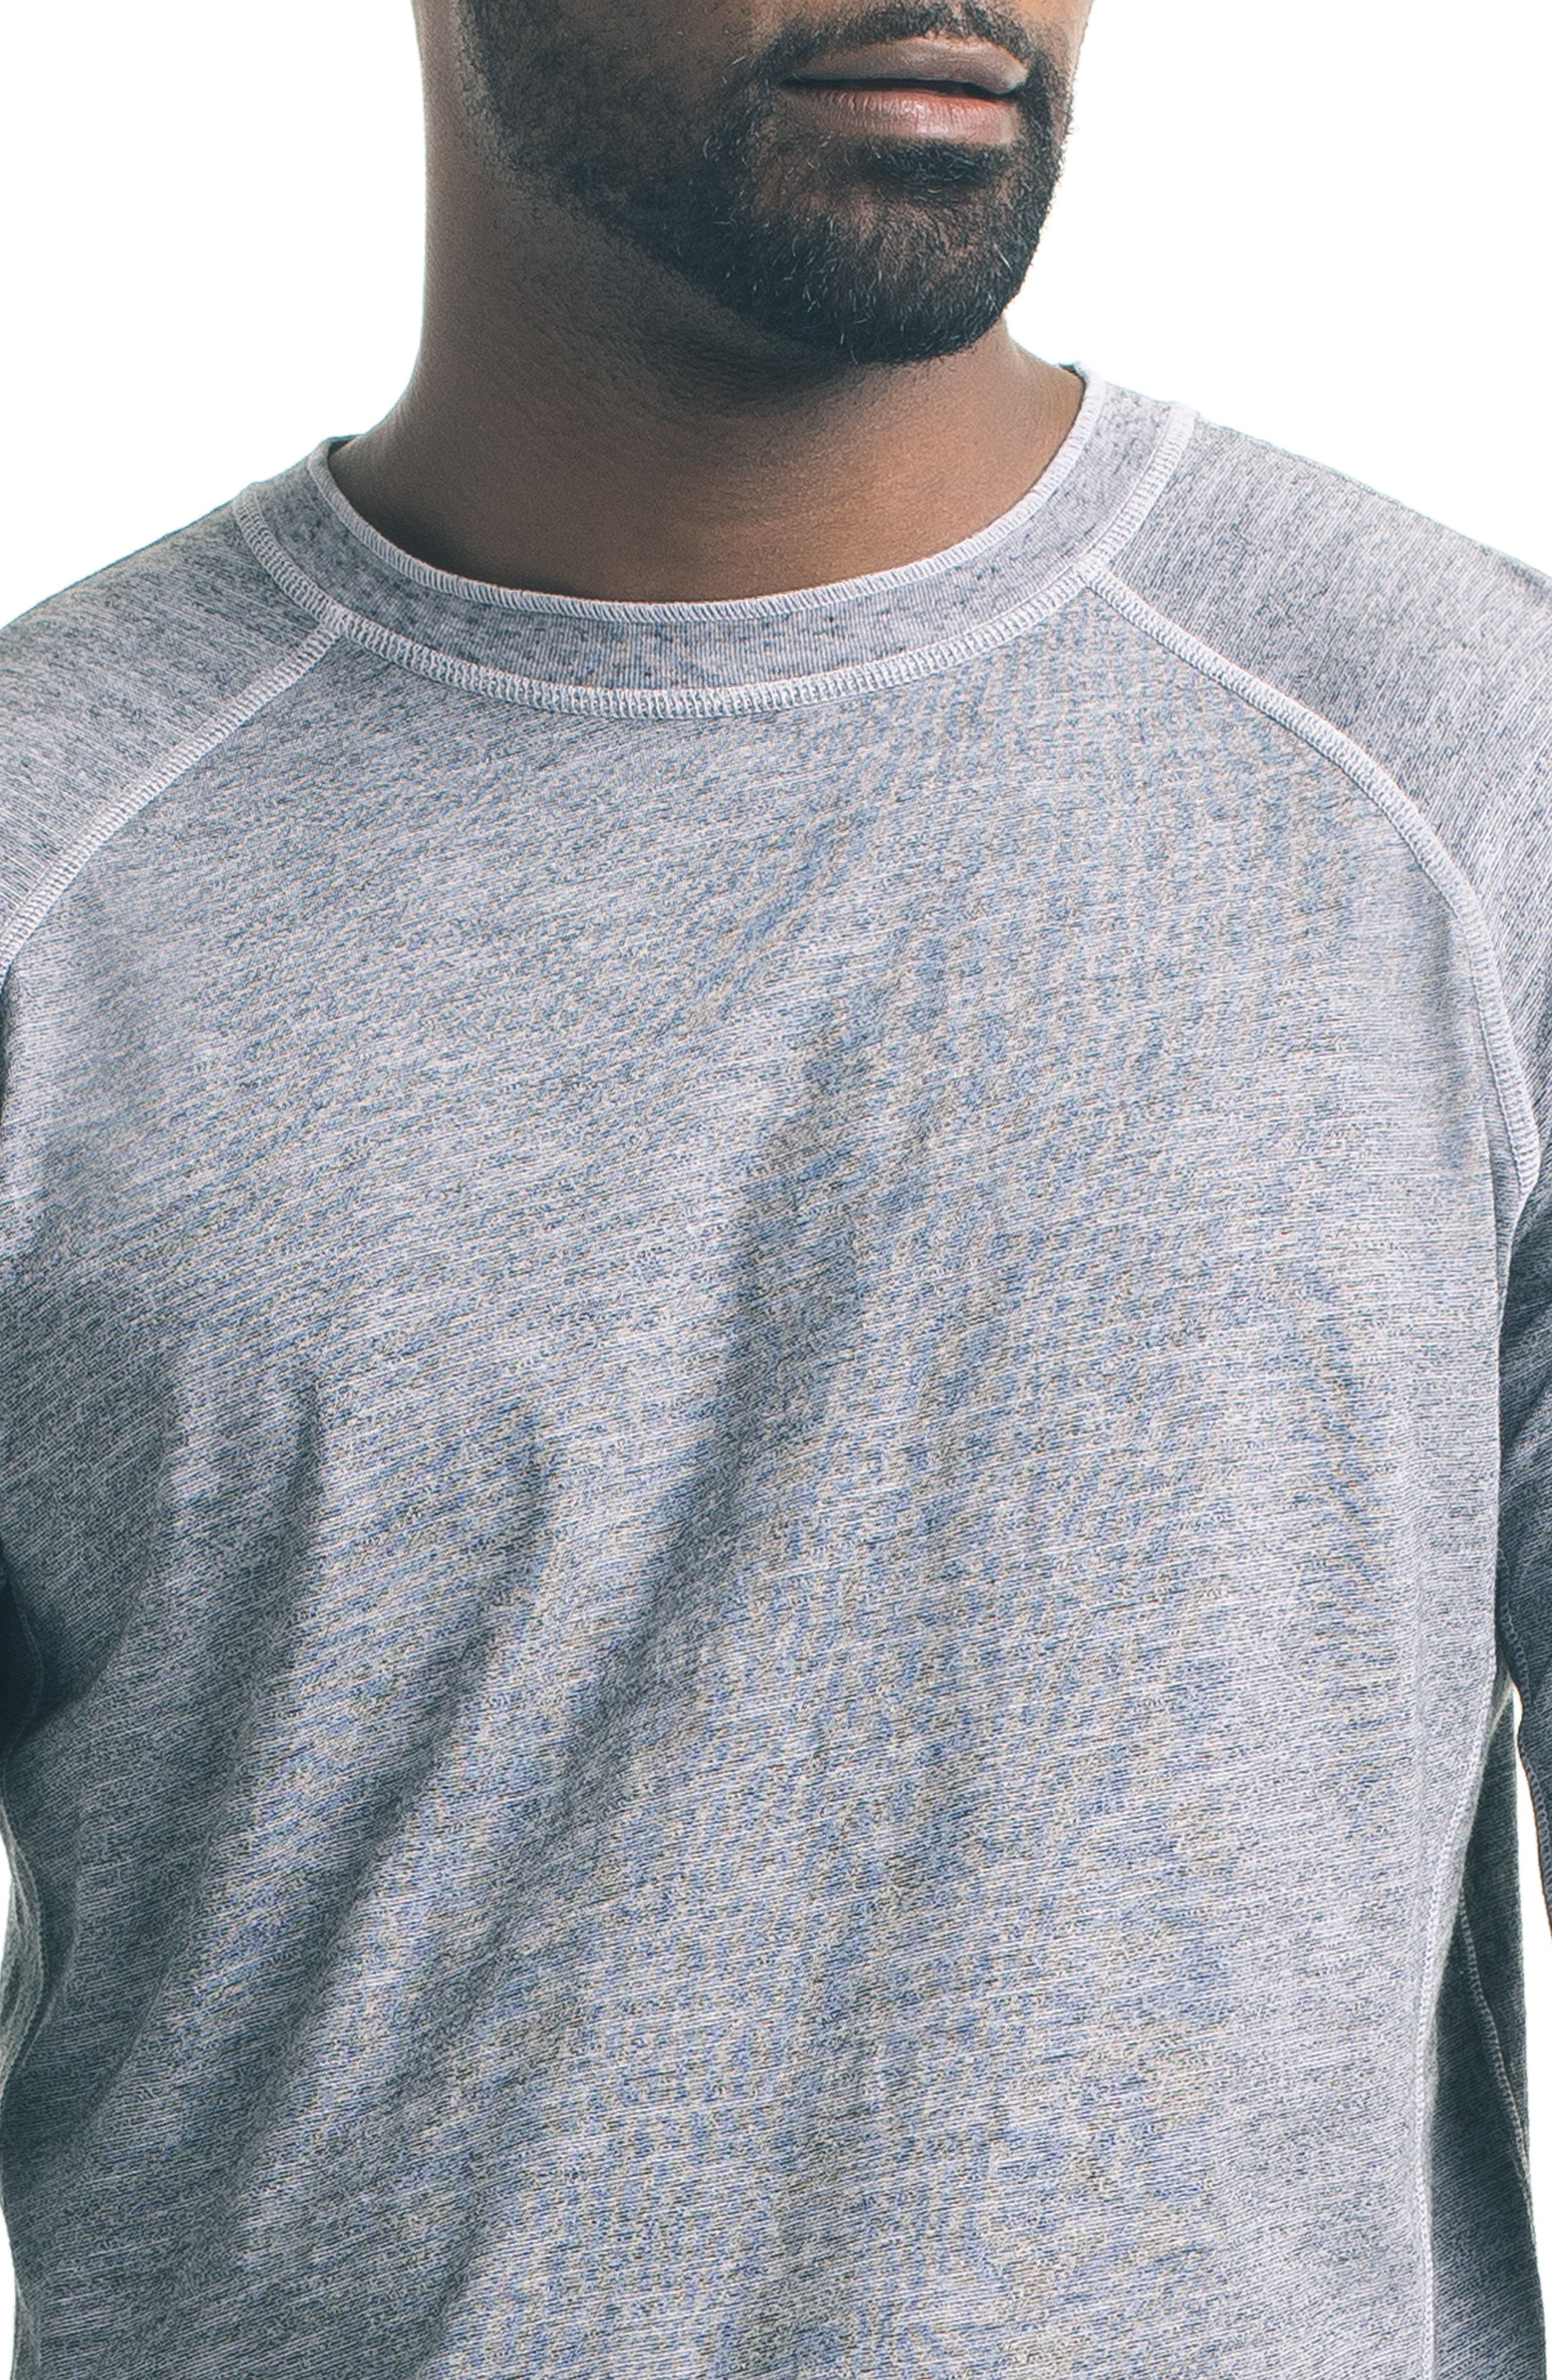 Raglan Sleeve T-Shirt,                             Alternate thumbnail 4, color,                             028